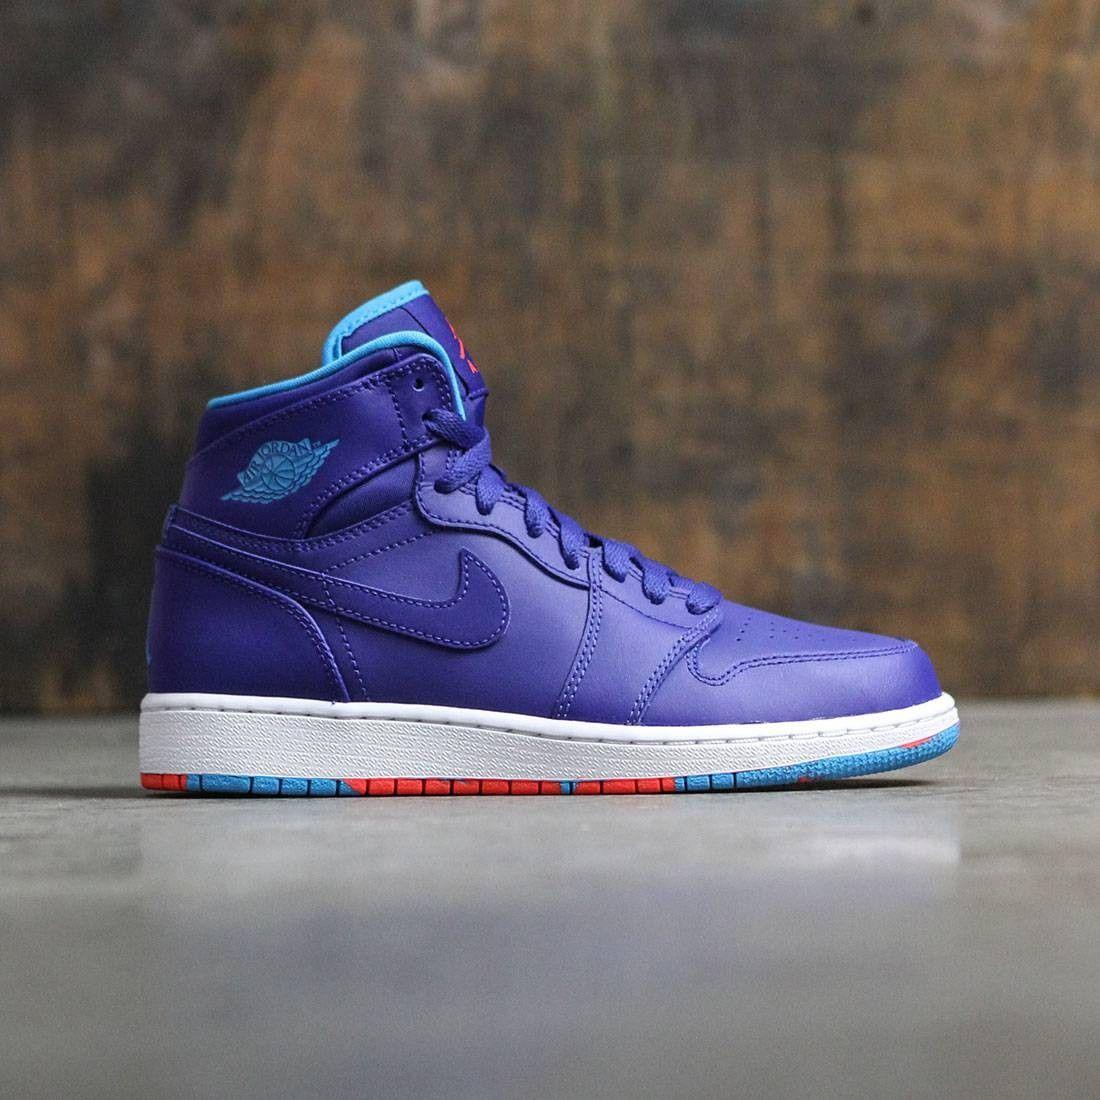 jordans 23 blue